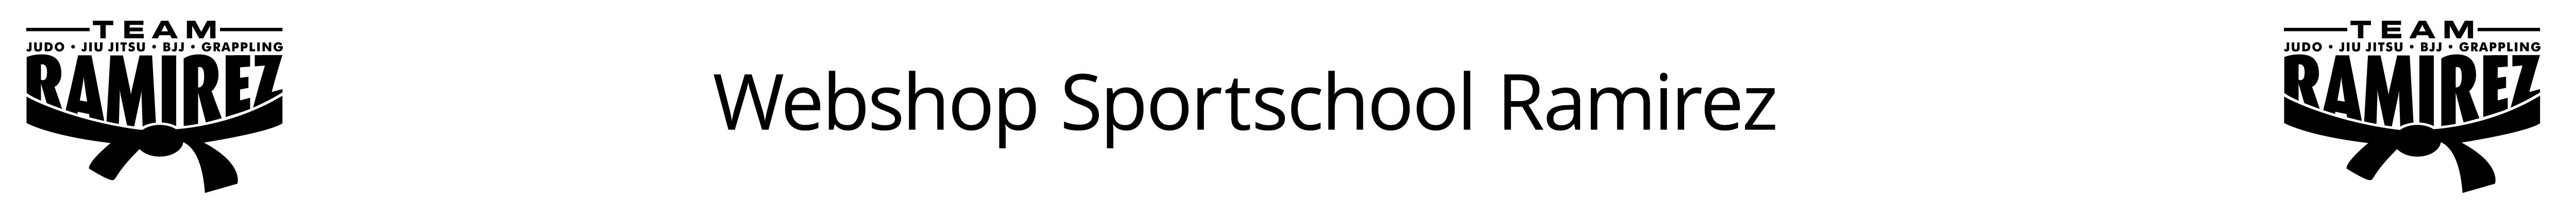 Sportschool Ramirez